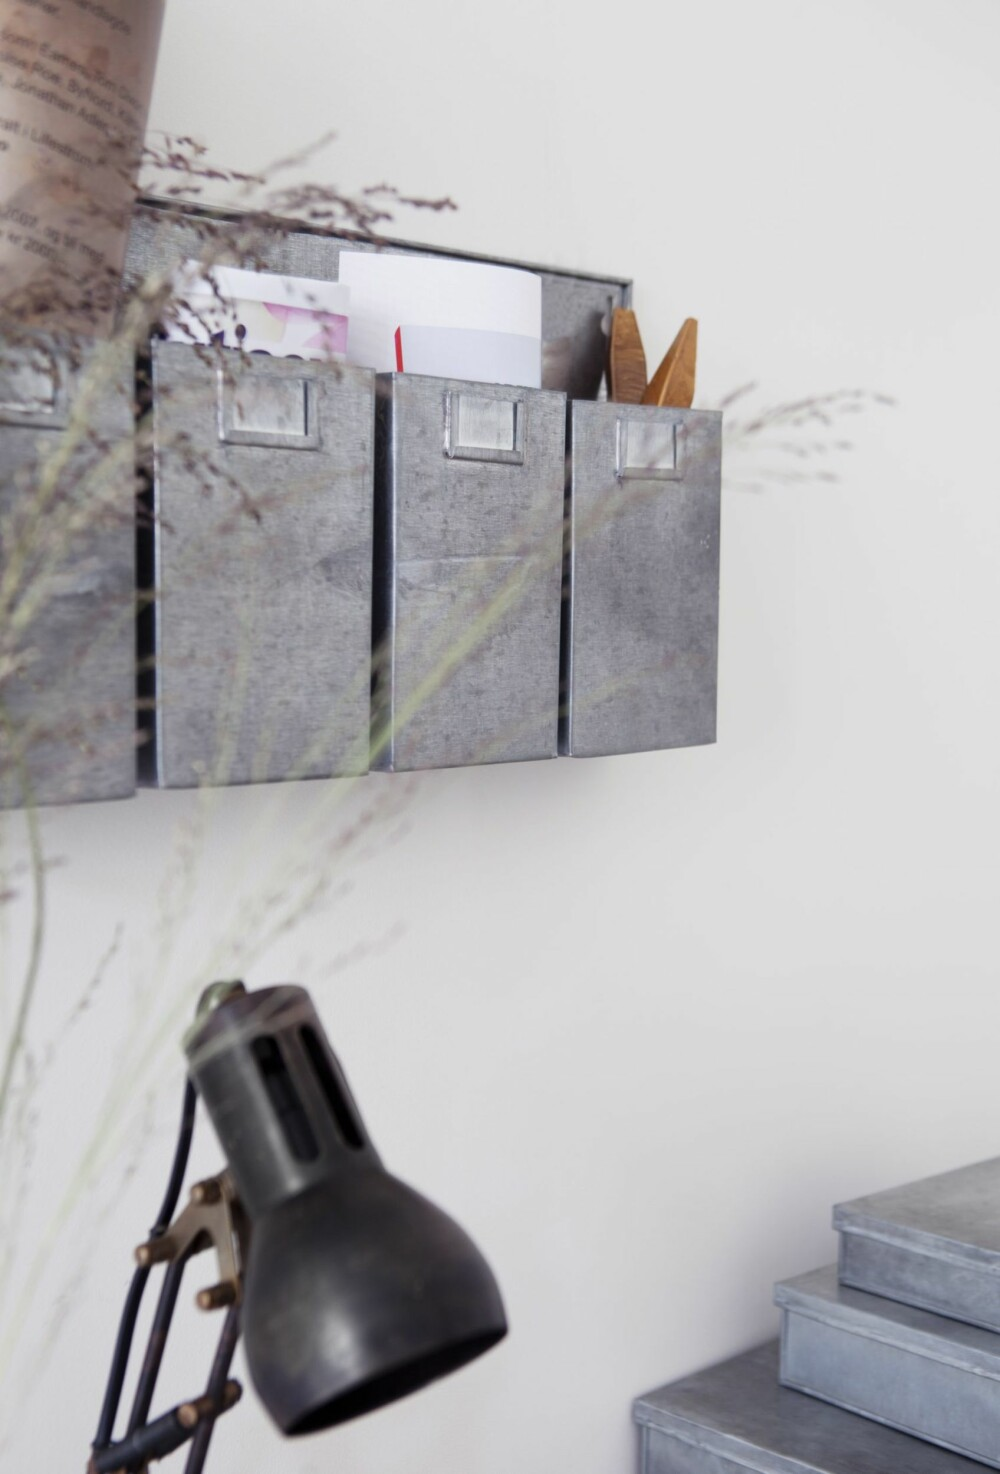 Posthyllen i sink, kr 300, Granit, er praktisk til sortering og har god plass samtidig.